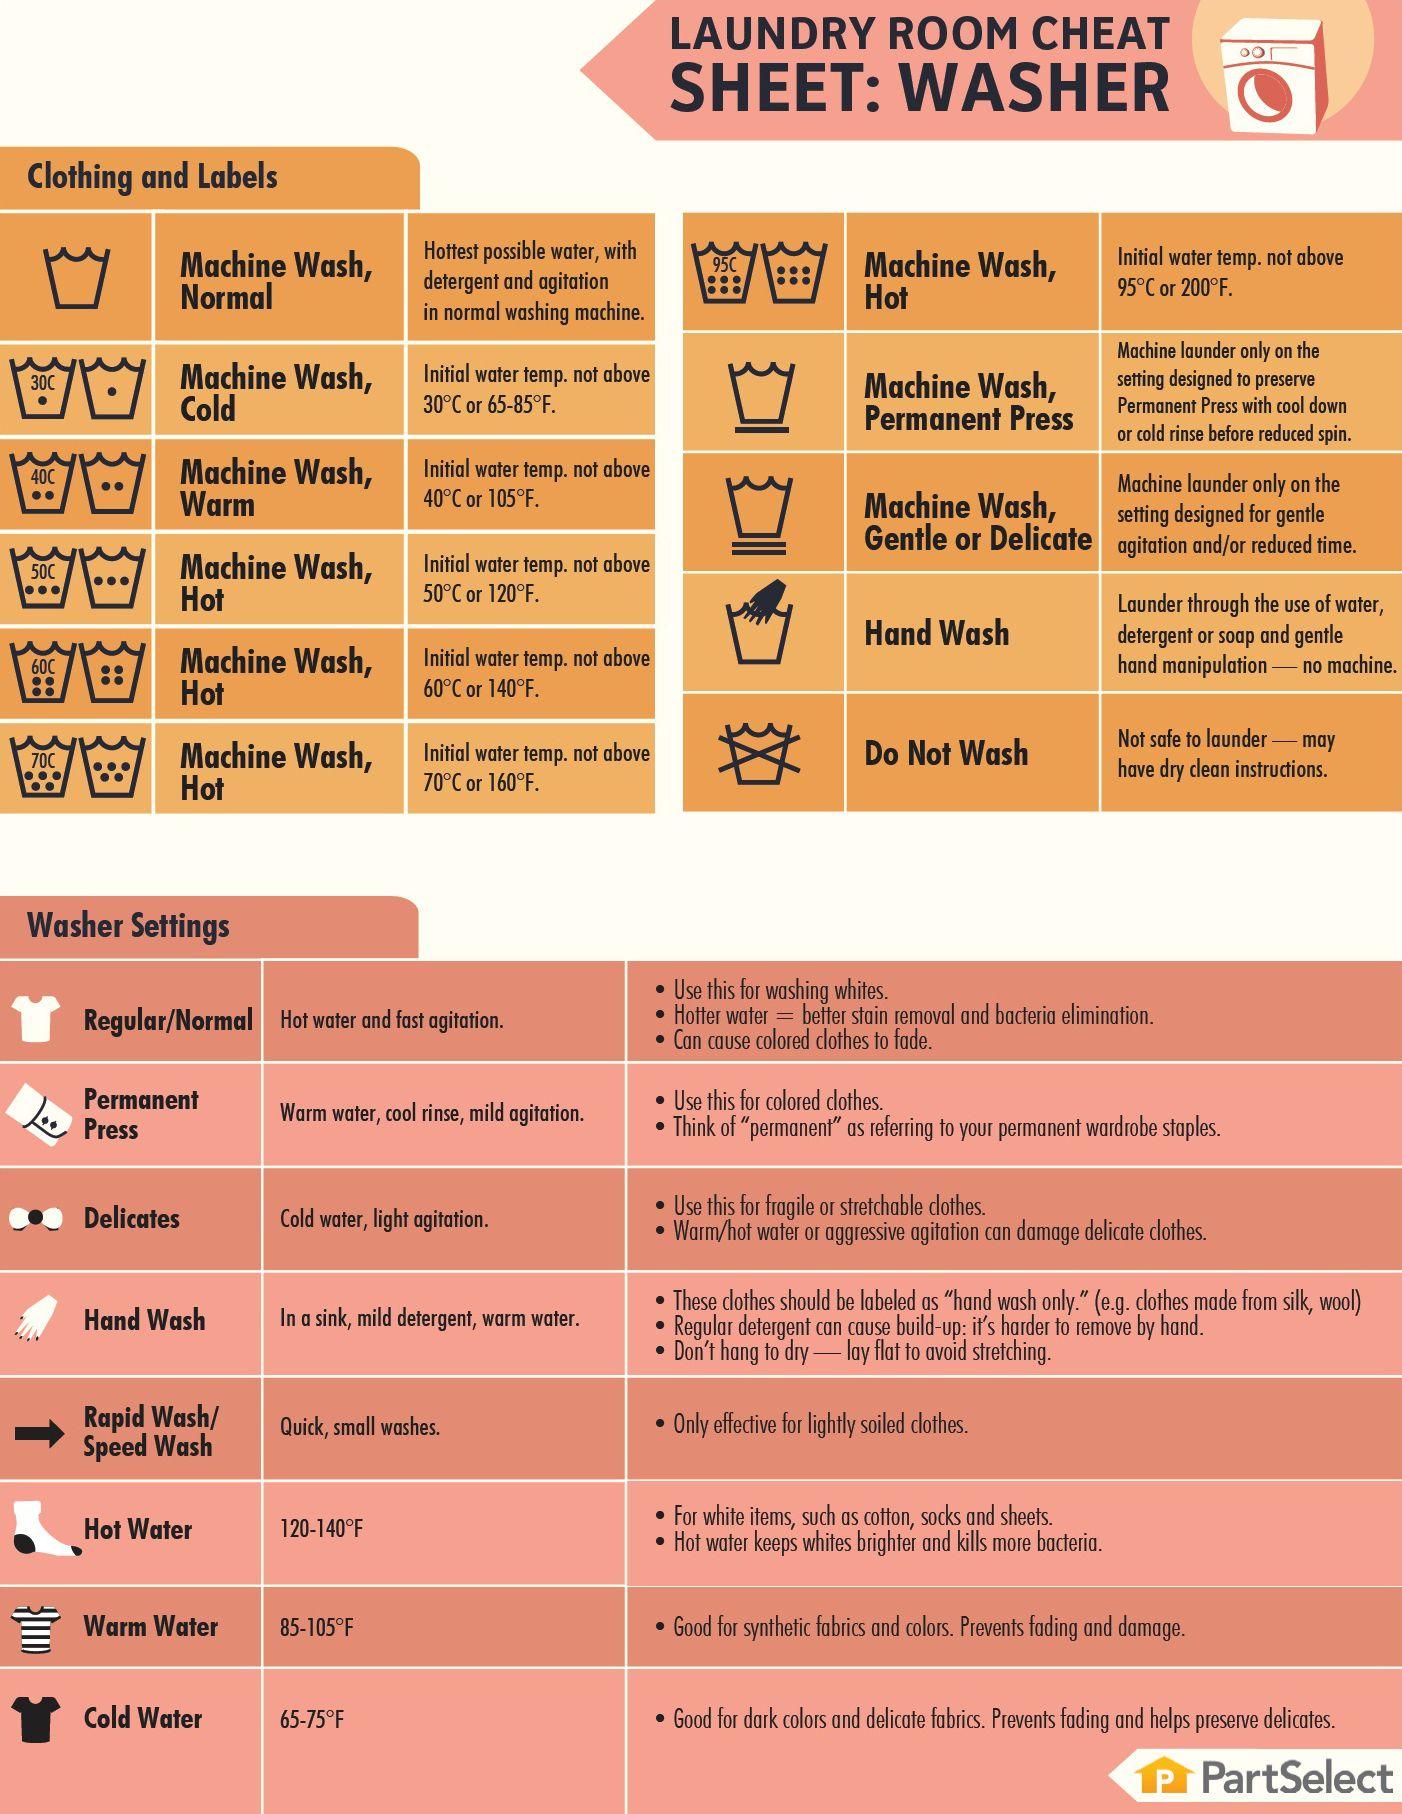 Top ten best quiet washing machines 2017 laundry room cheat sheet laundry chart on laundry symbols nvjuhfo Choice Image